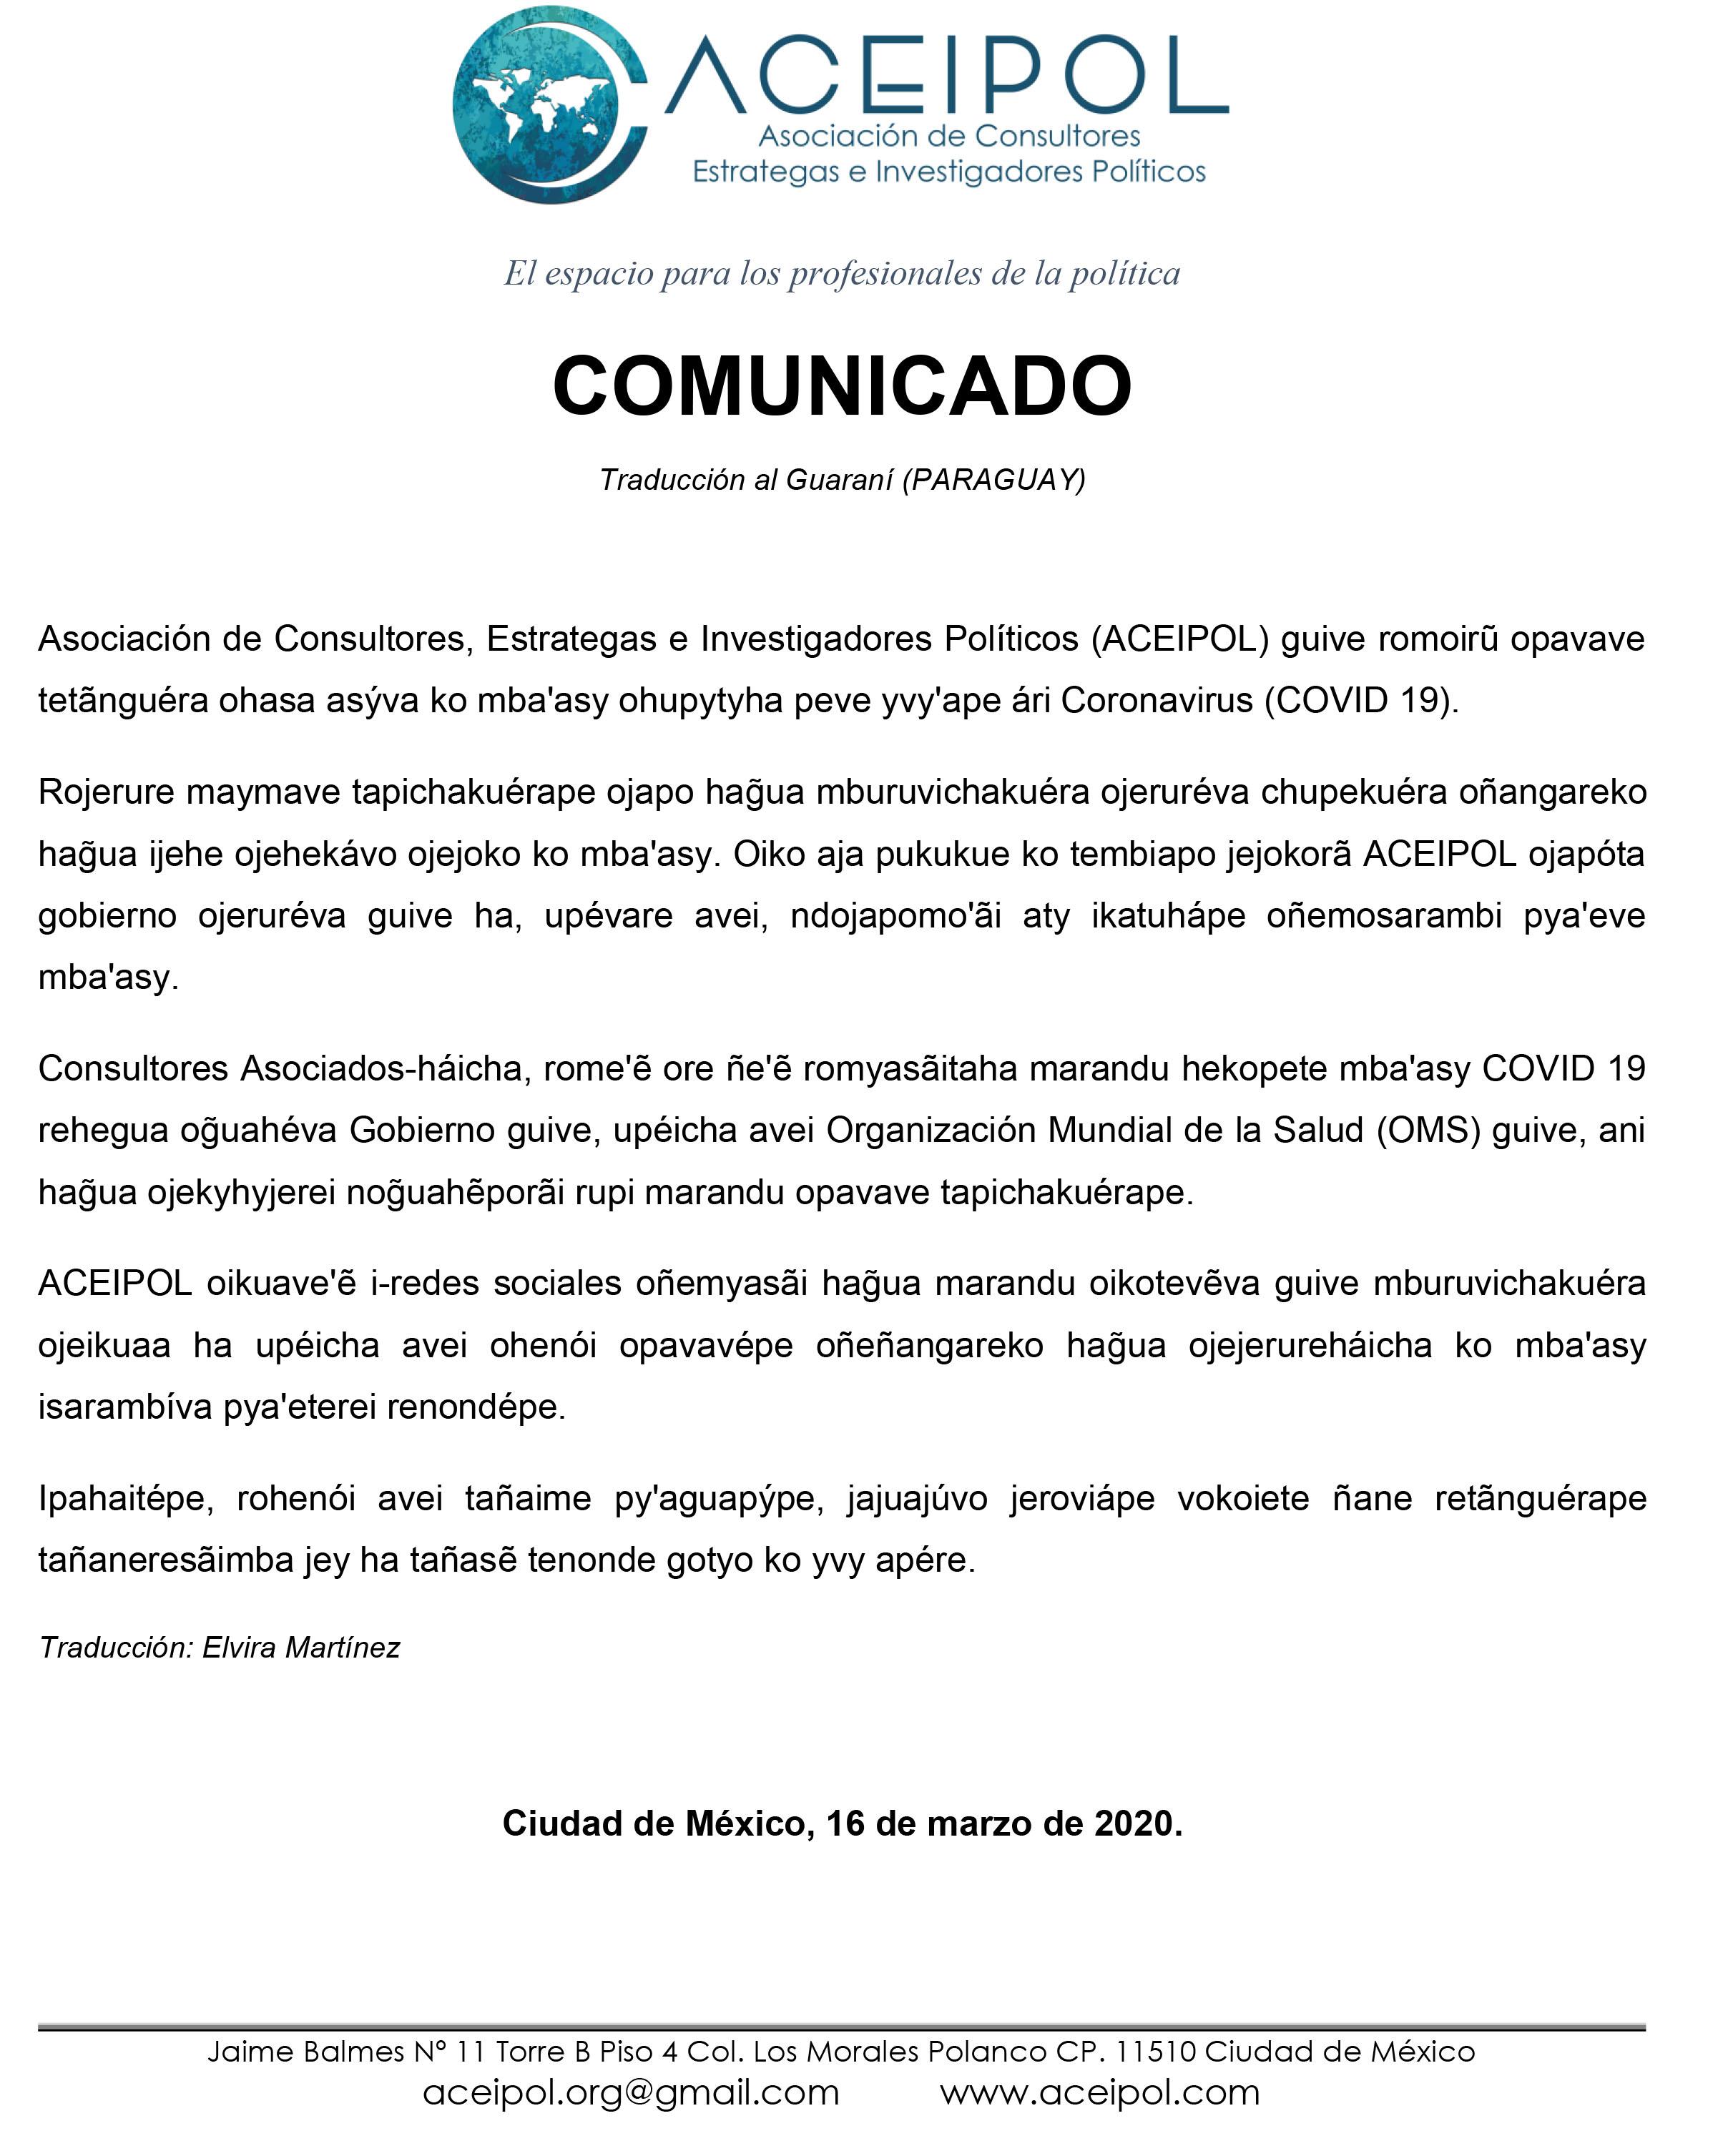 COMUNICADO_COVID_19_ACEIPOL_Guaraní-1